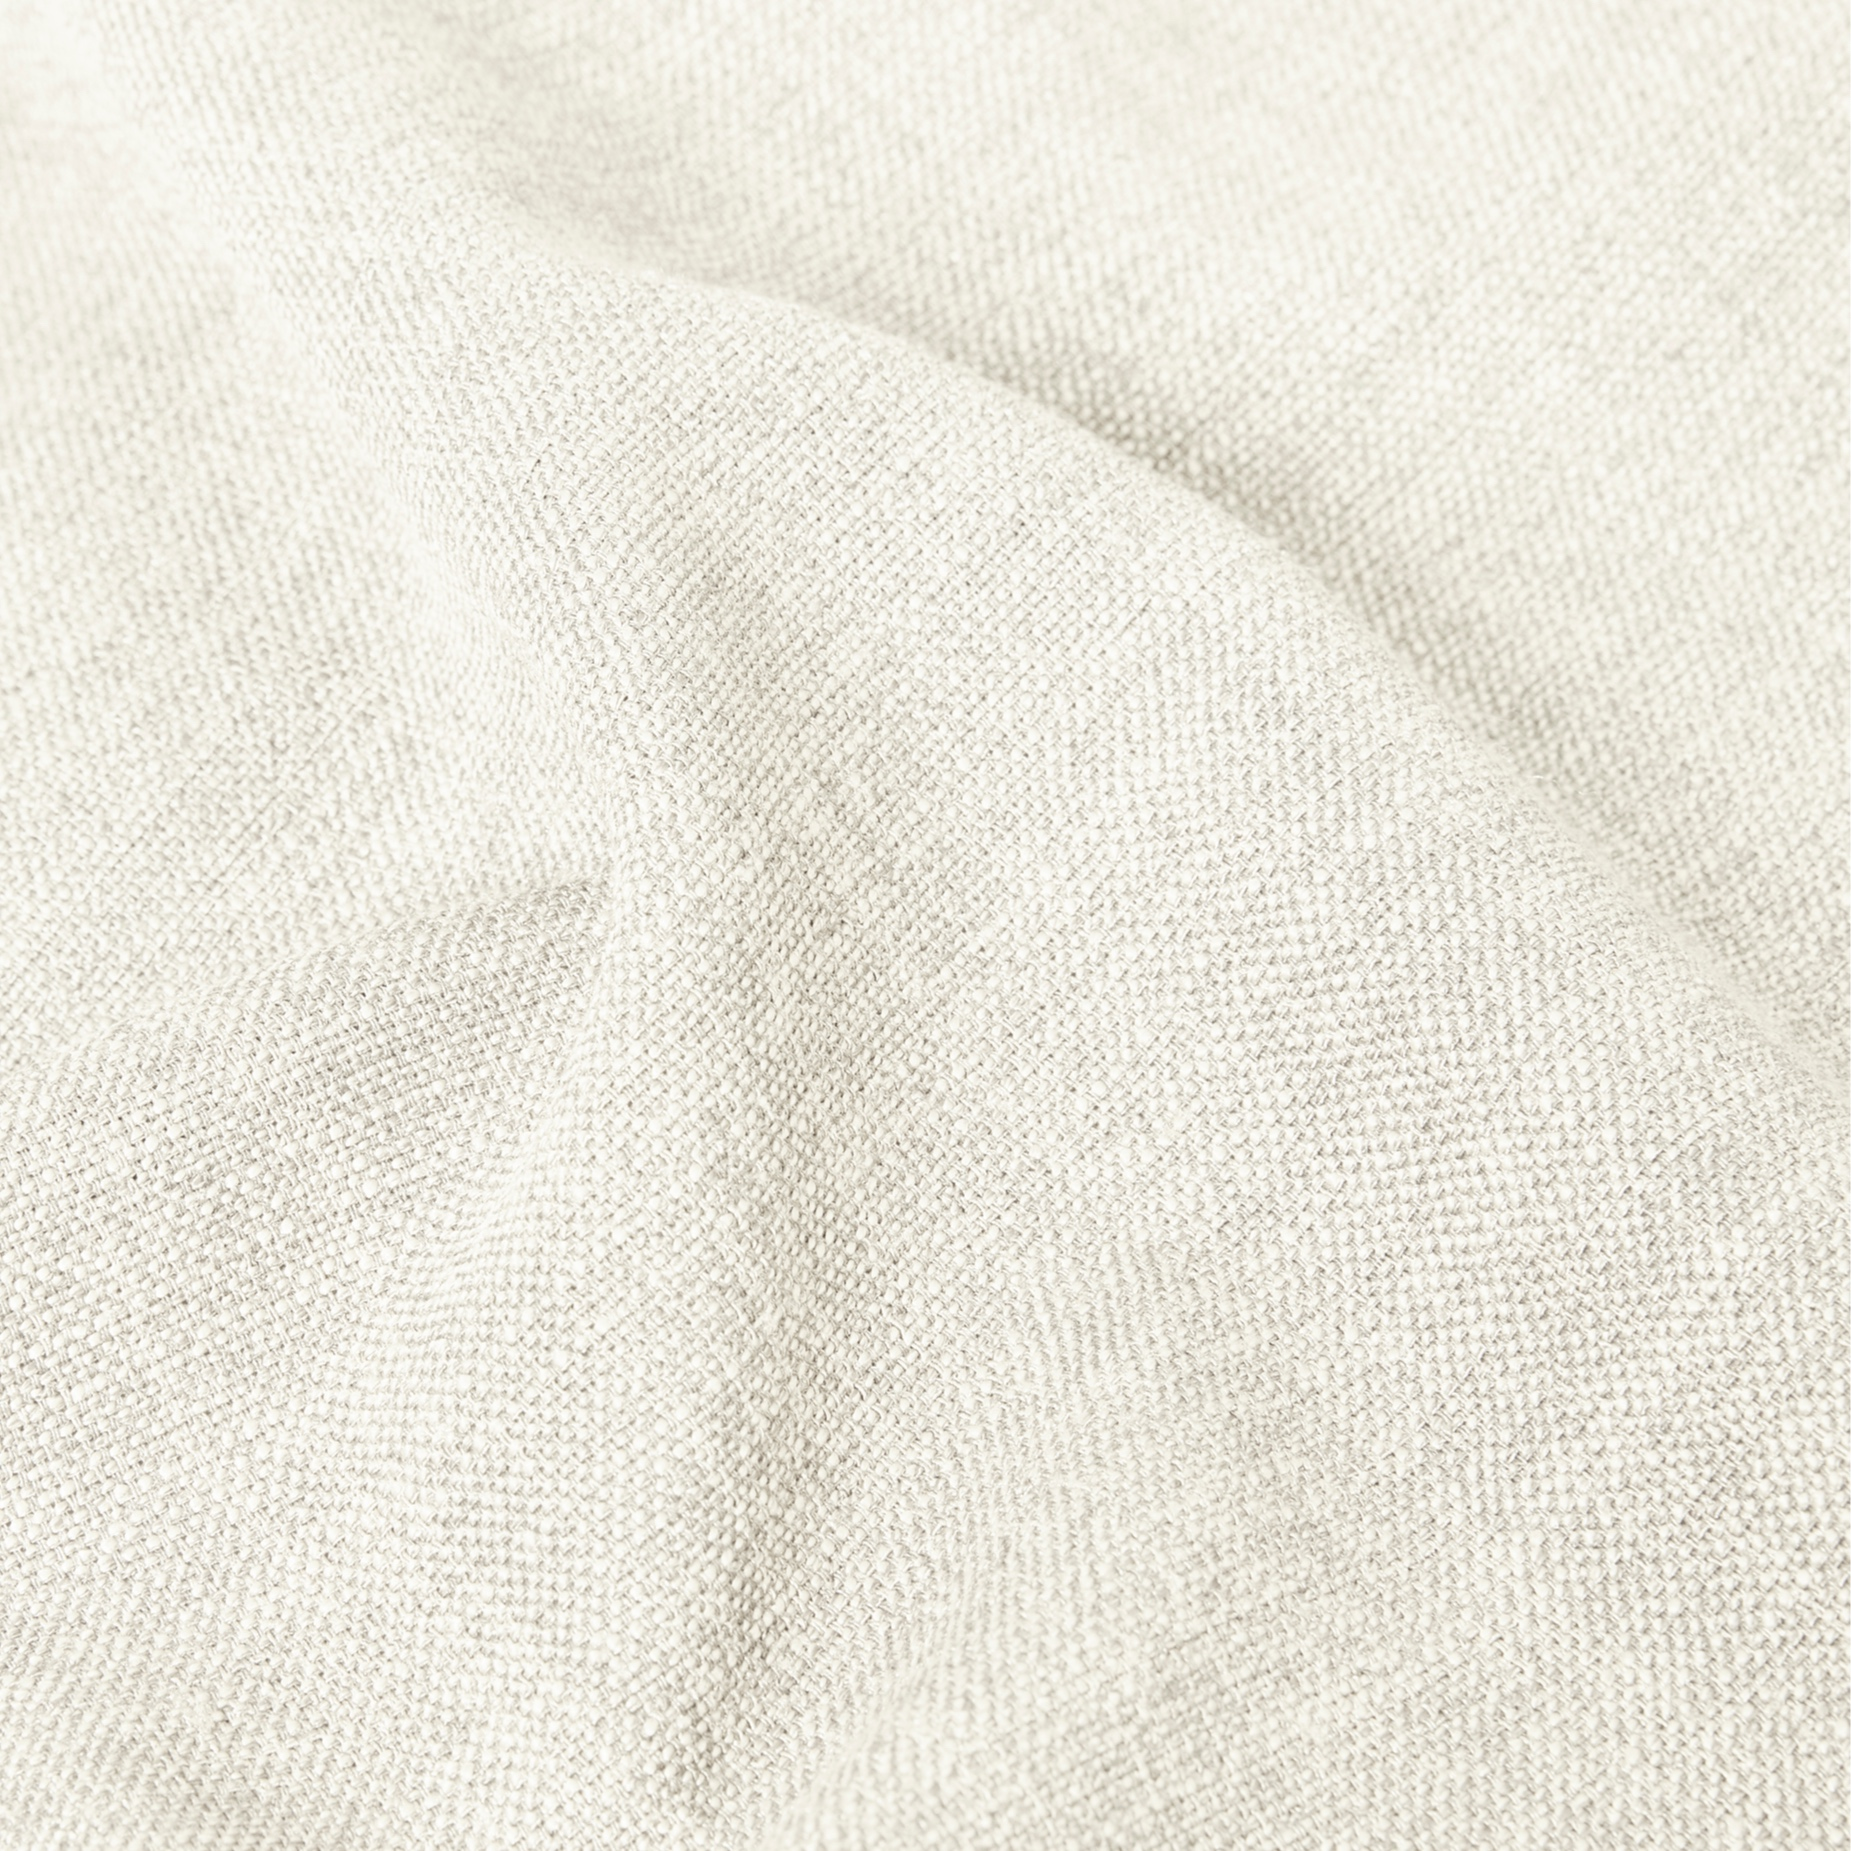 Rustic White Creme.jpg